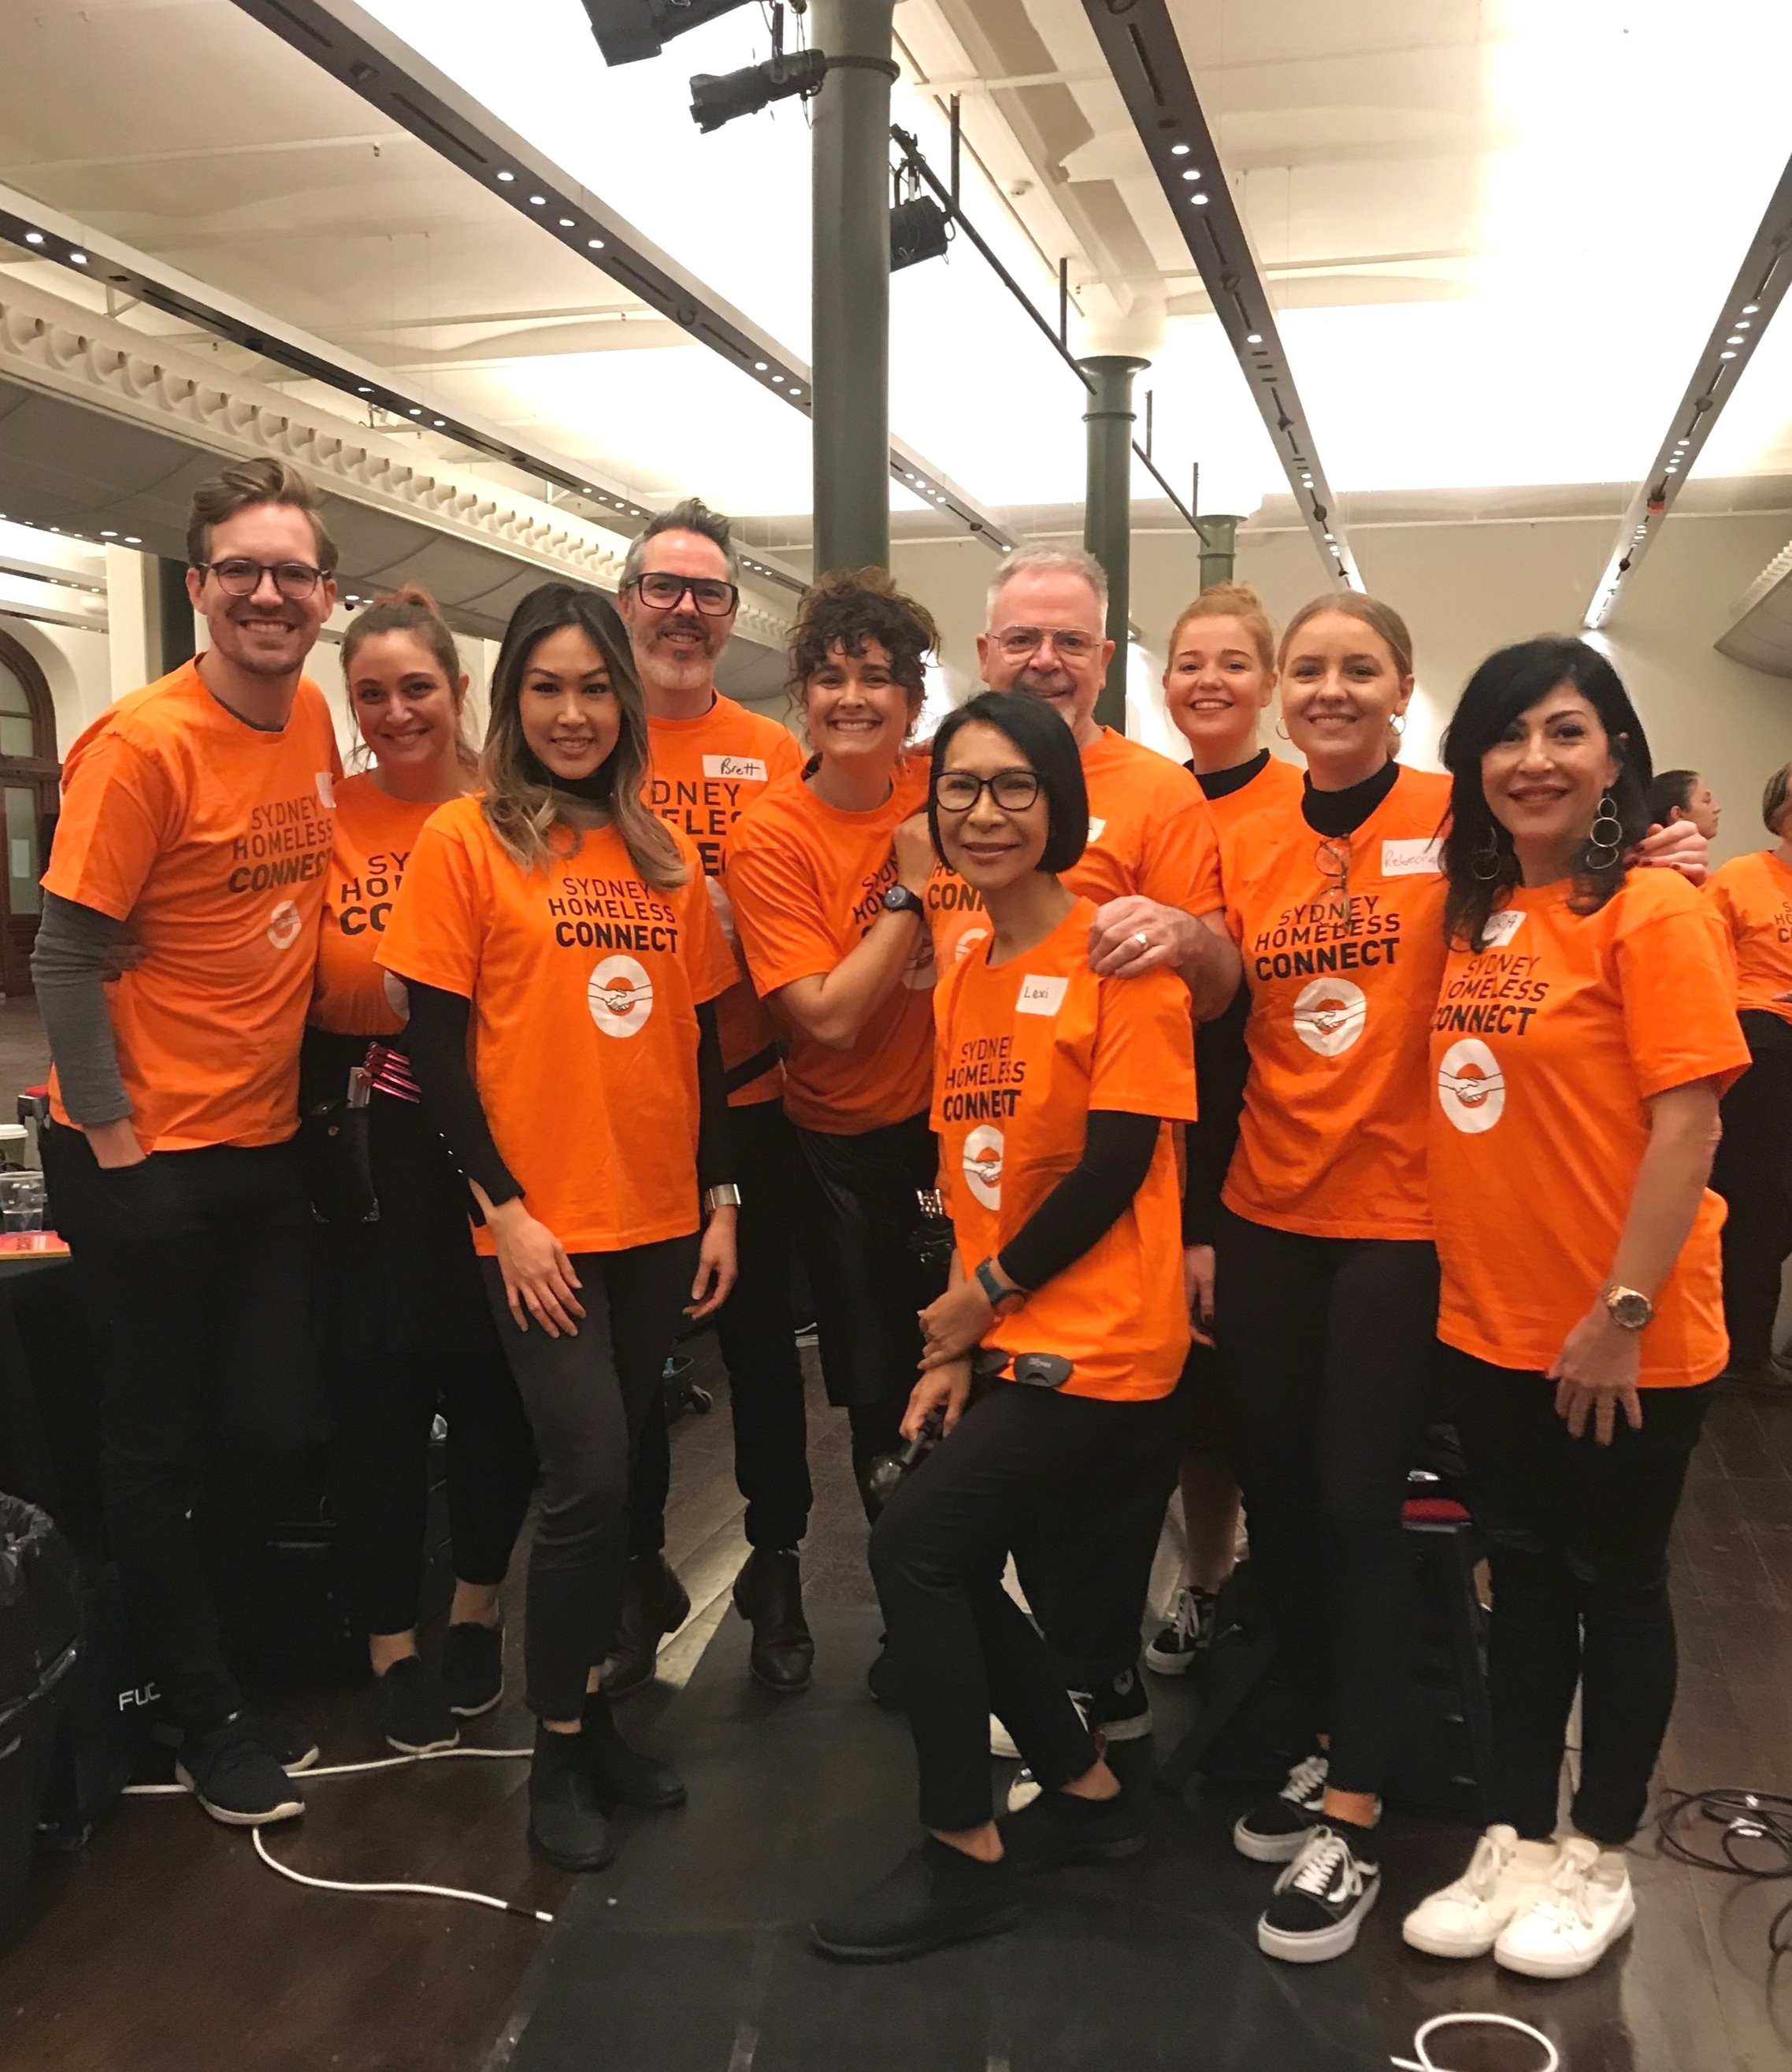 team sydney homeless connect 2019